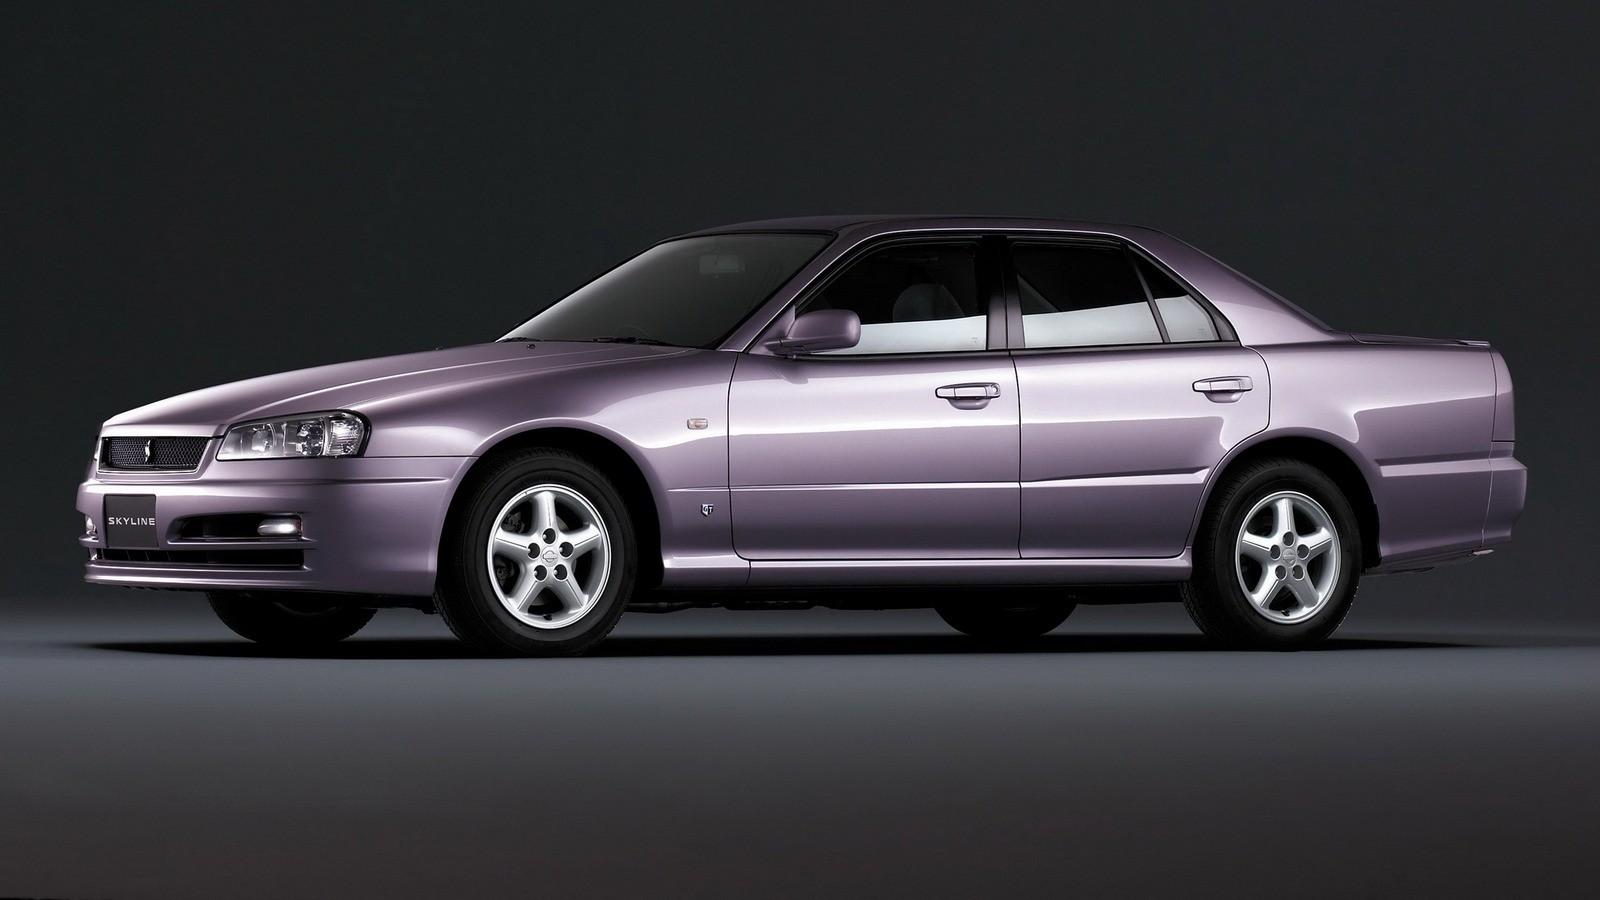 Nissan Skyline 25GT-X Turbo Sedan (R34) '05.1998–08.2000 сзади